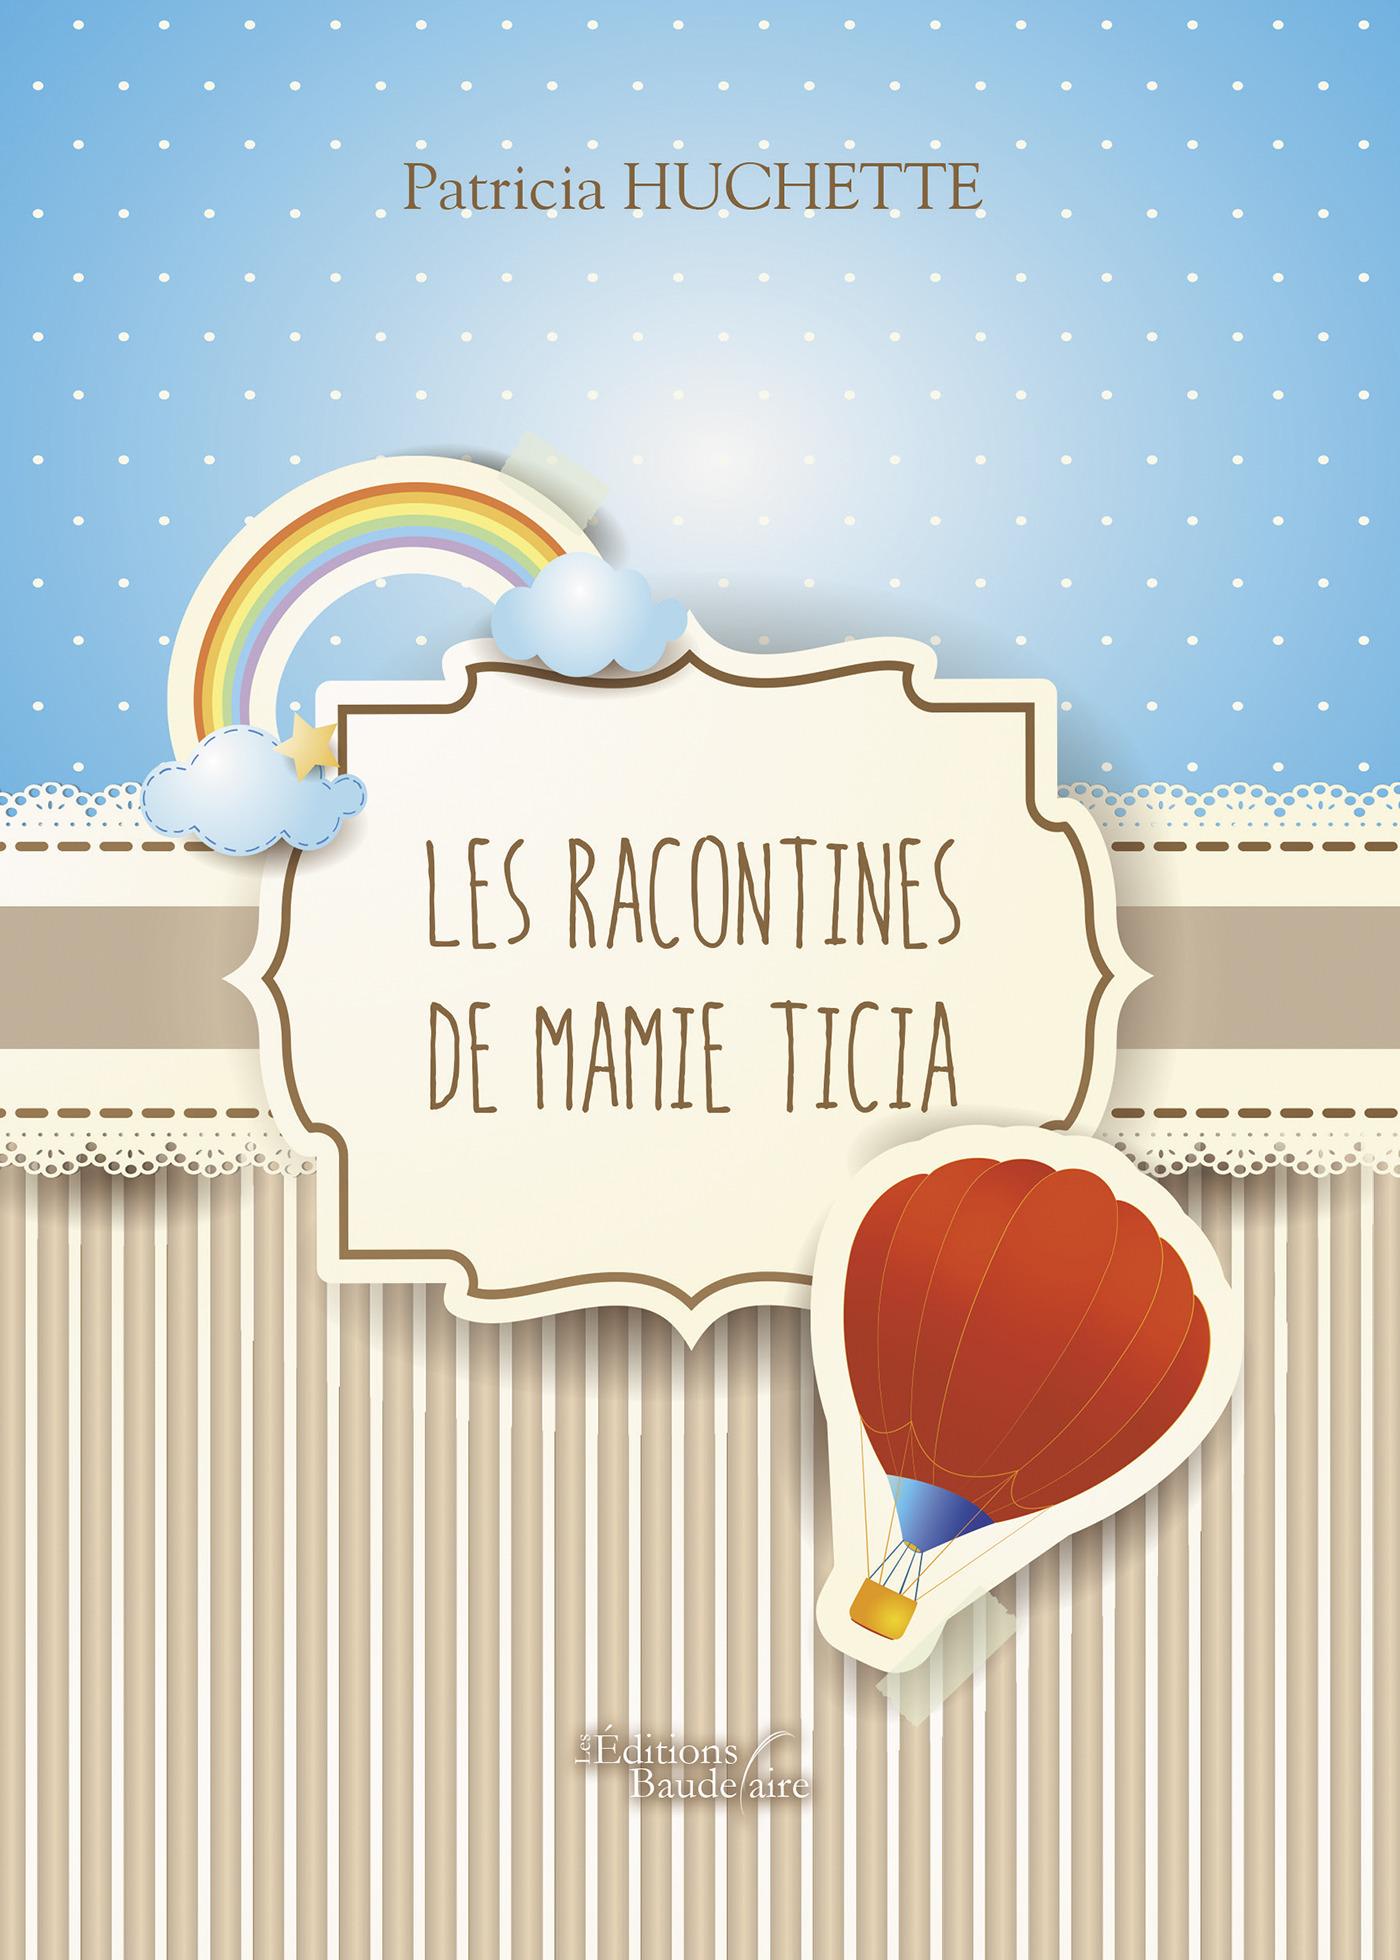 Les racontines de Mamie Ticia